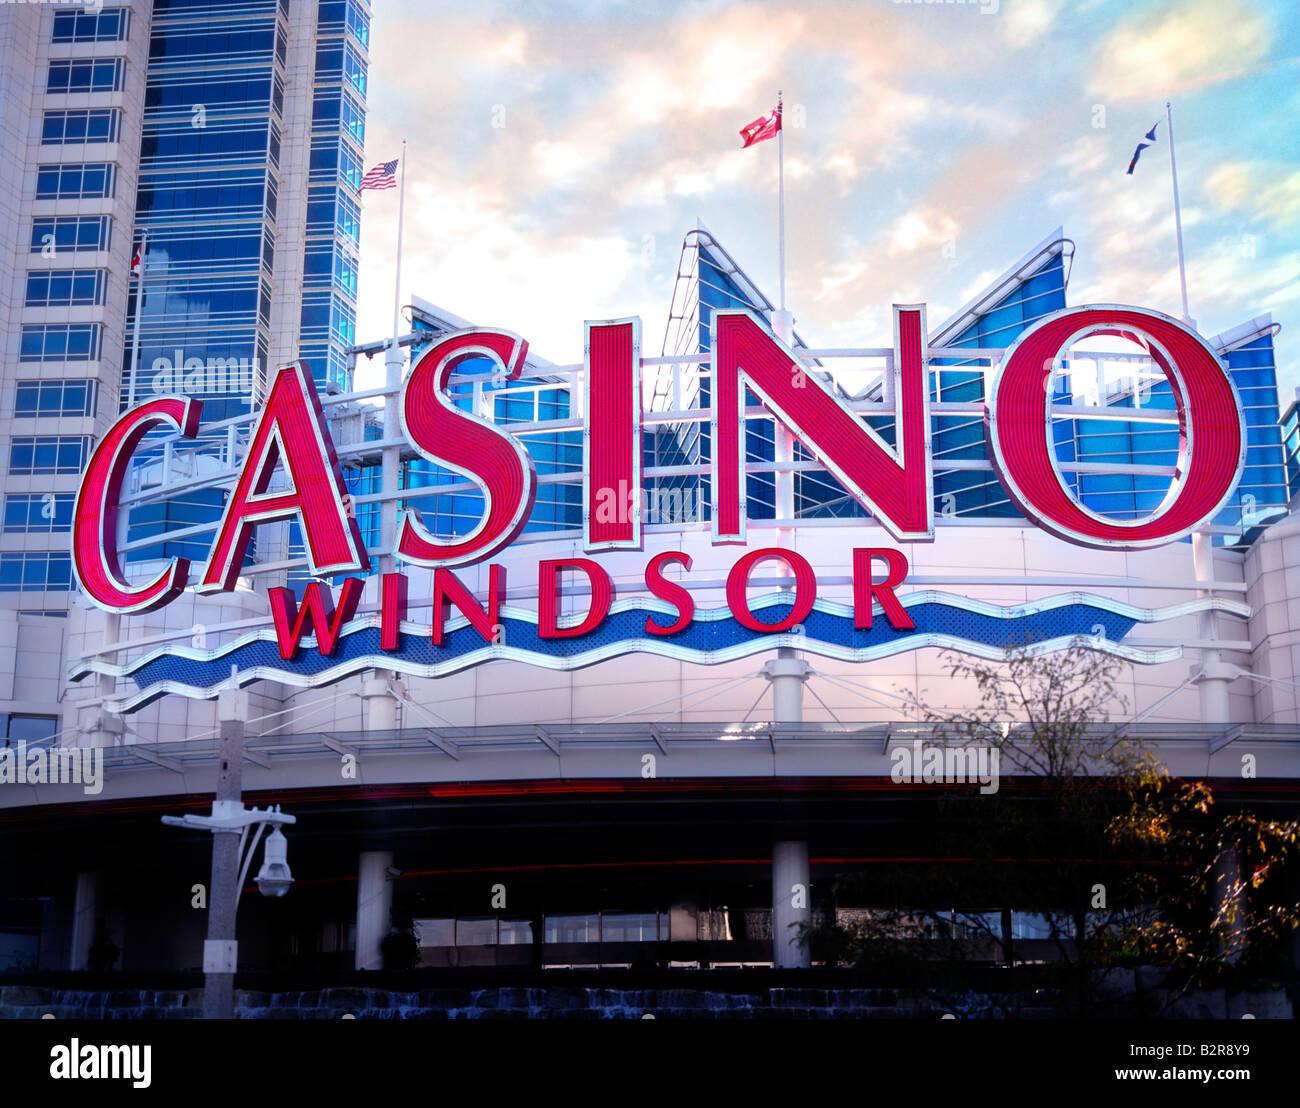 Casino in ontario canada watch movies casino